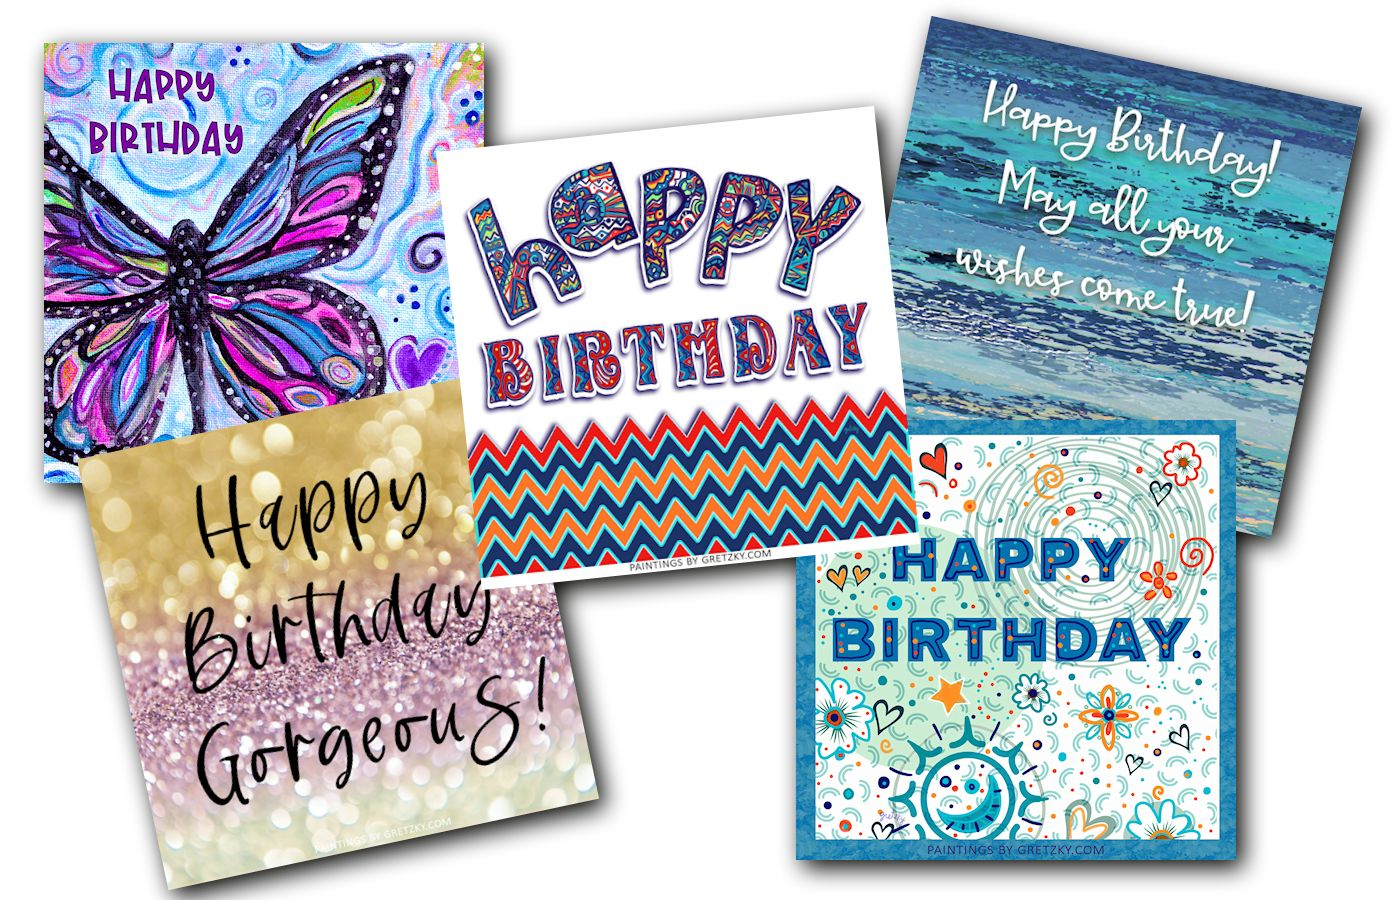 Free Digital Birthday Cards Digital Birthday Cards Birthday Cards Make Your Own Card